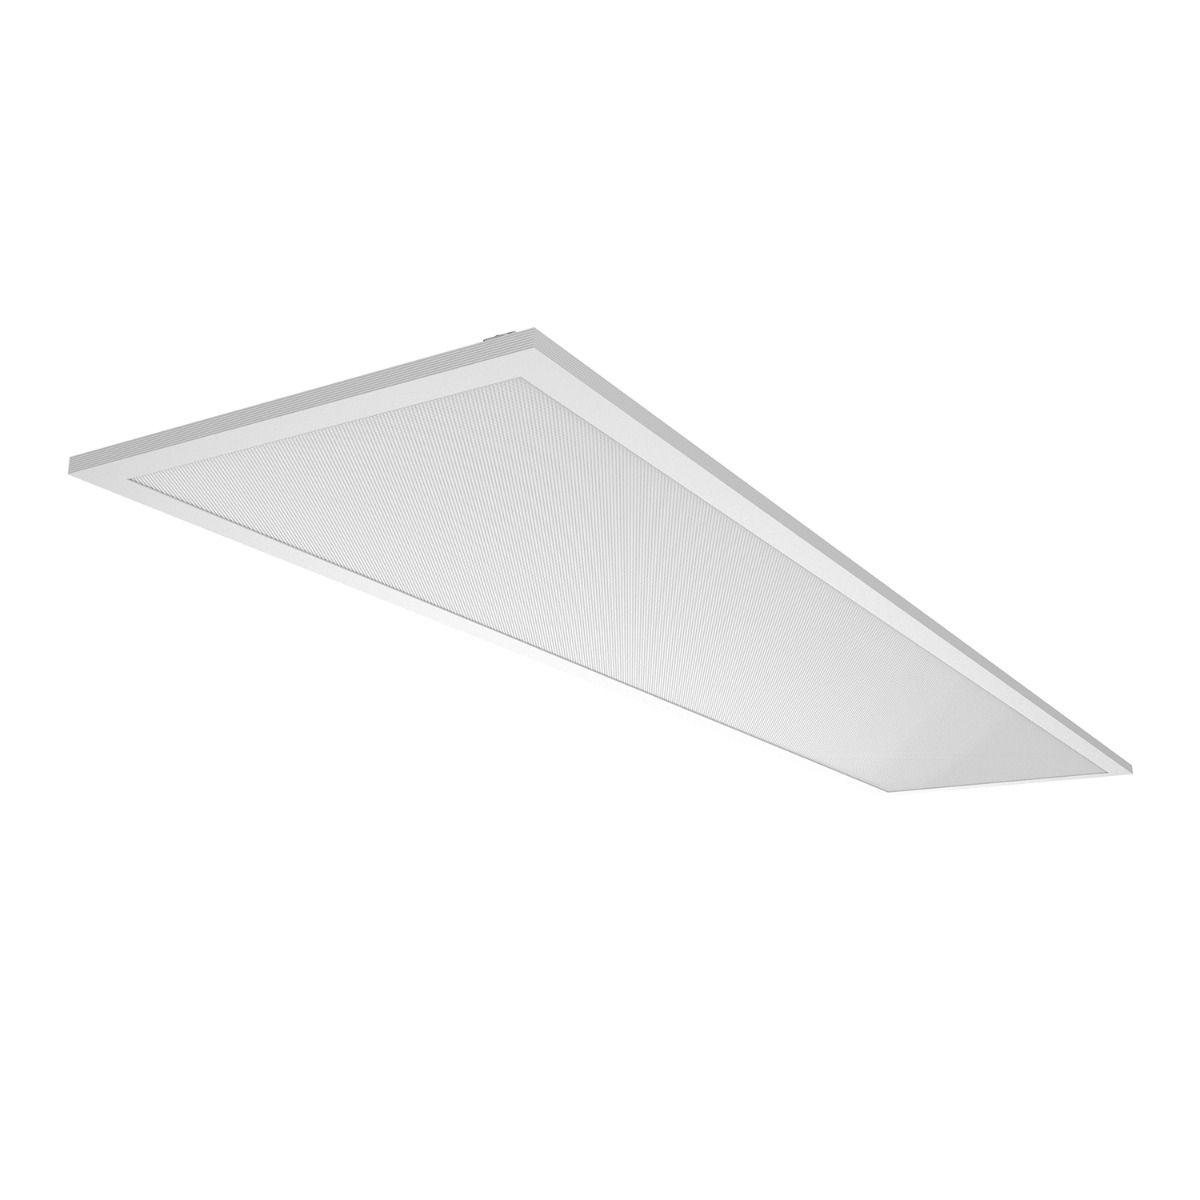 Noxion Panel LED Delta Pro V3 30W 4000K 4070lm 30x120cm UGR <19   Blanco Frio - Reemplazo 2x36W